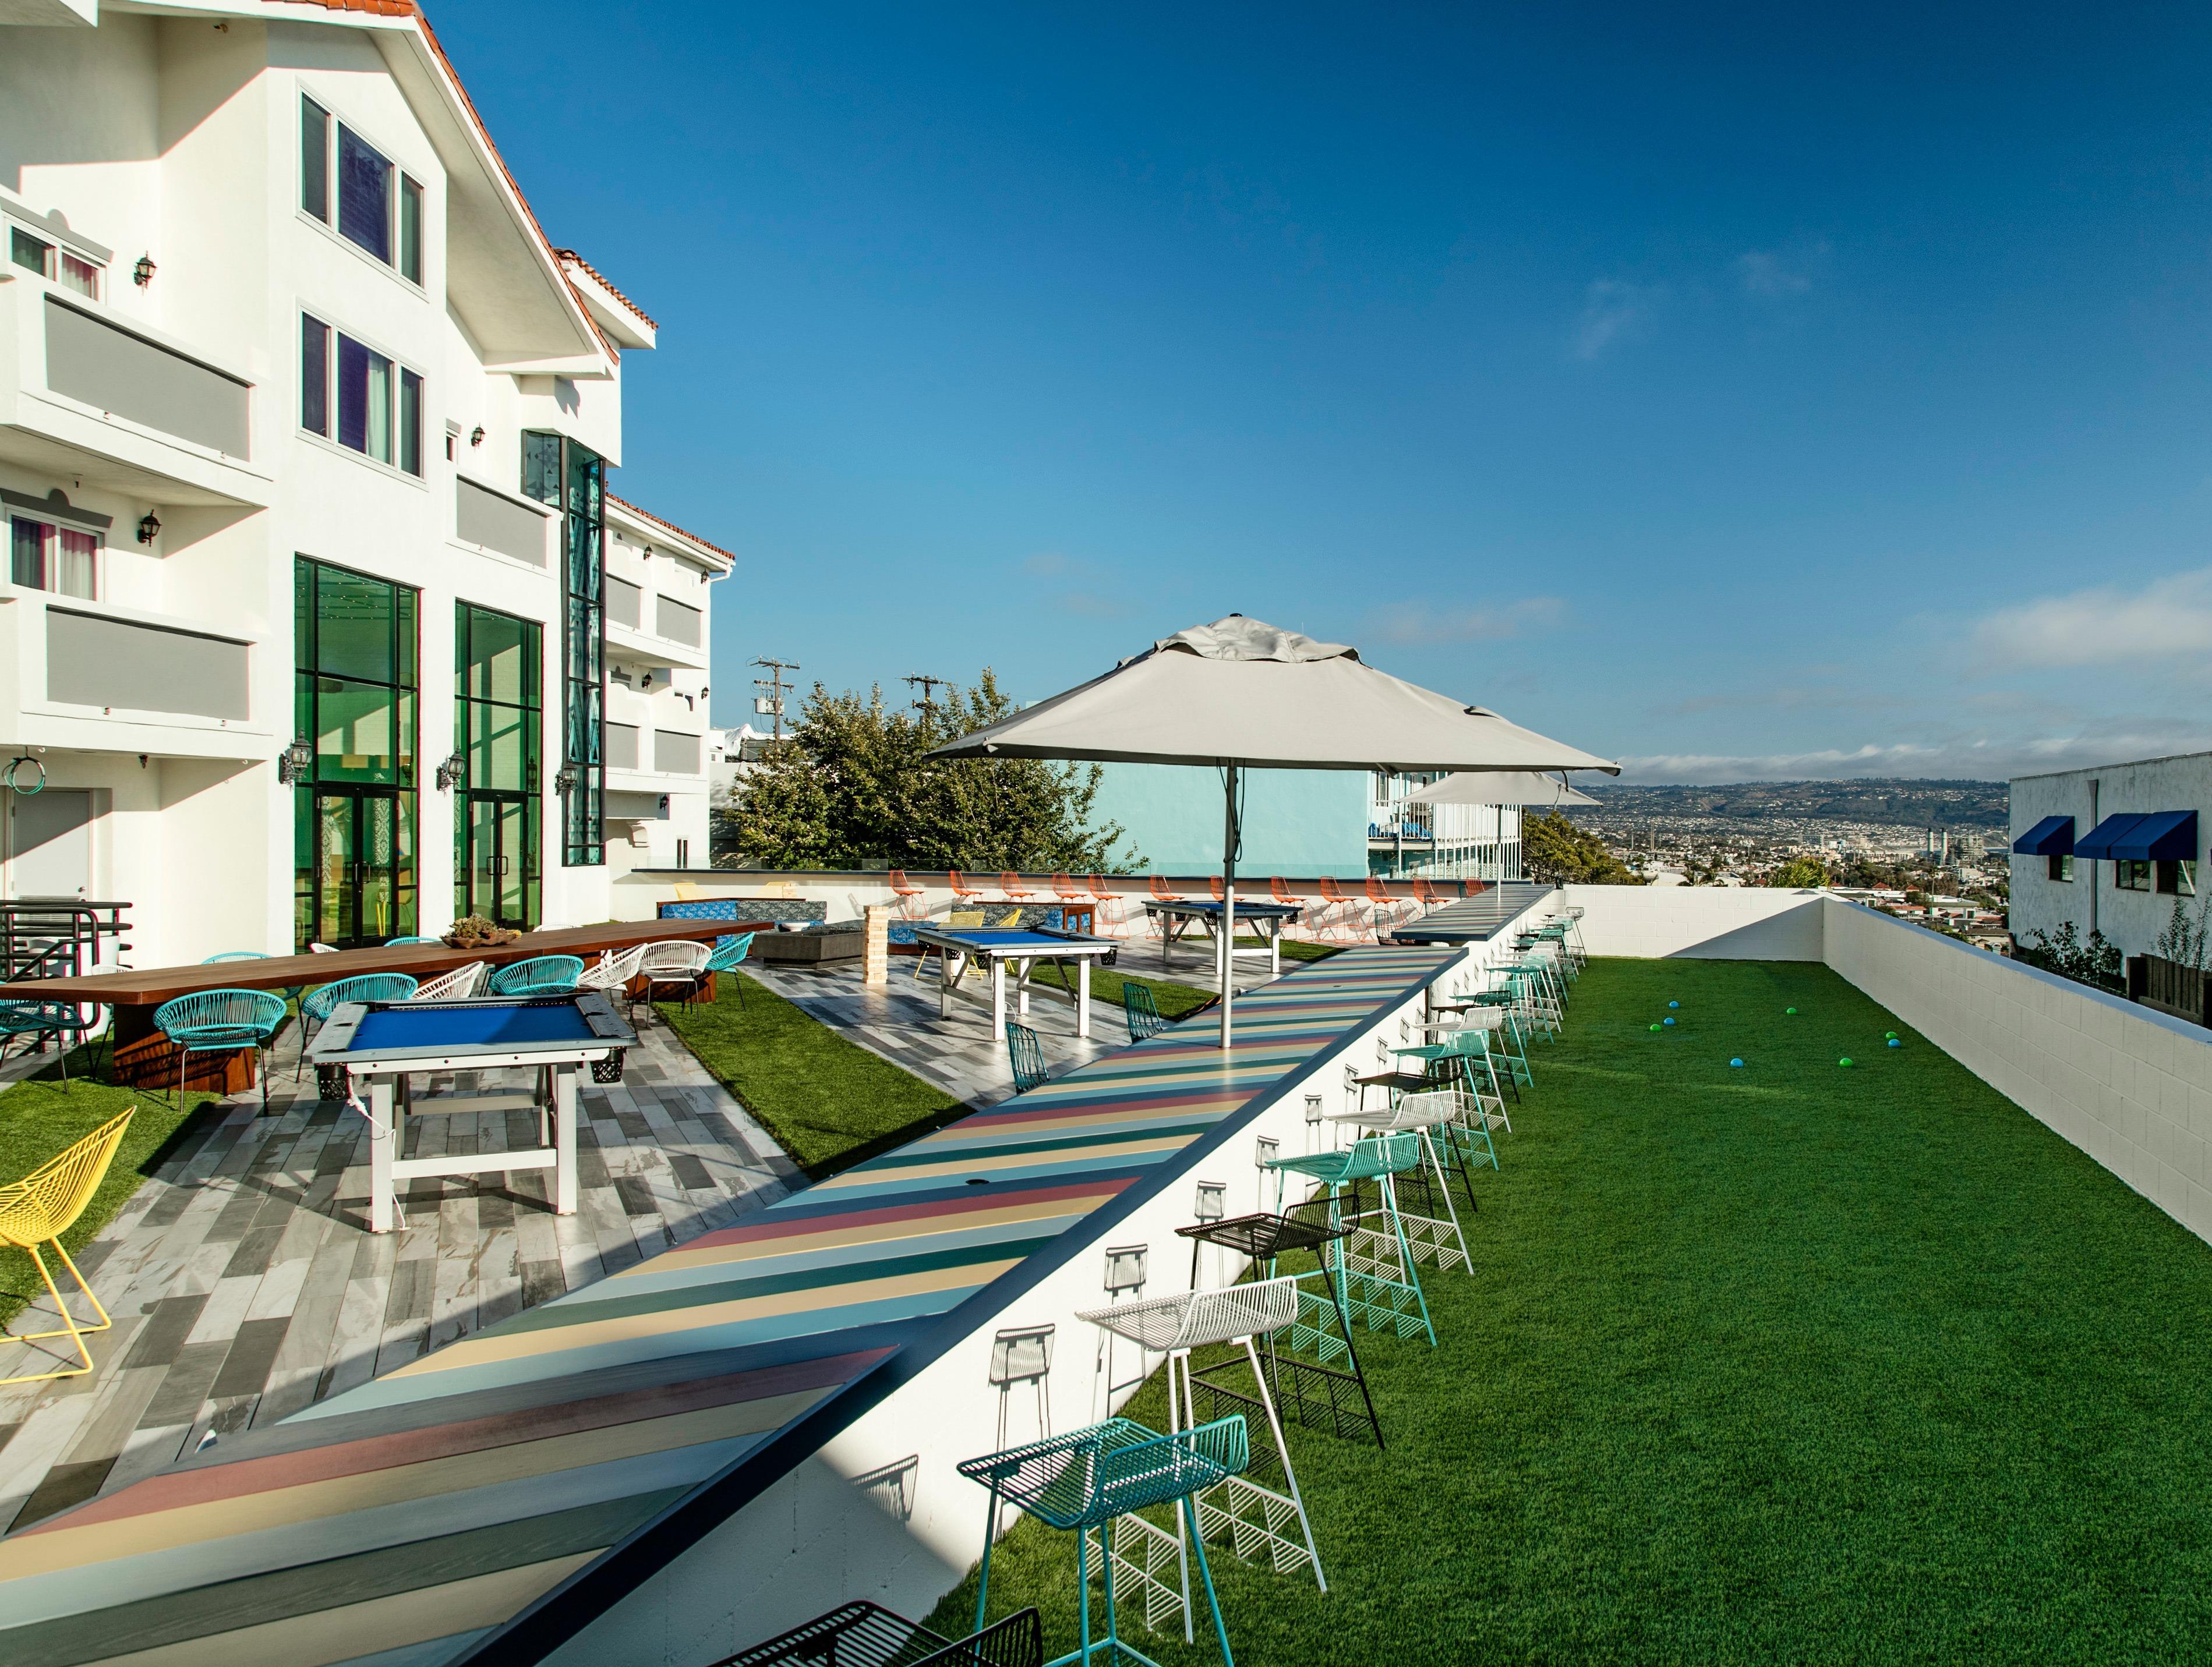 Hermosa Beach Motels Hotels